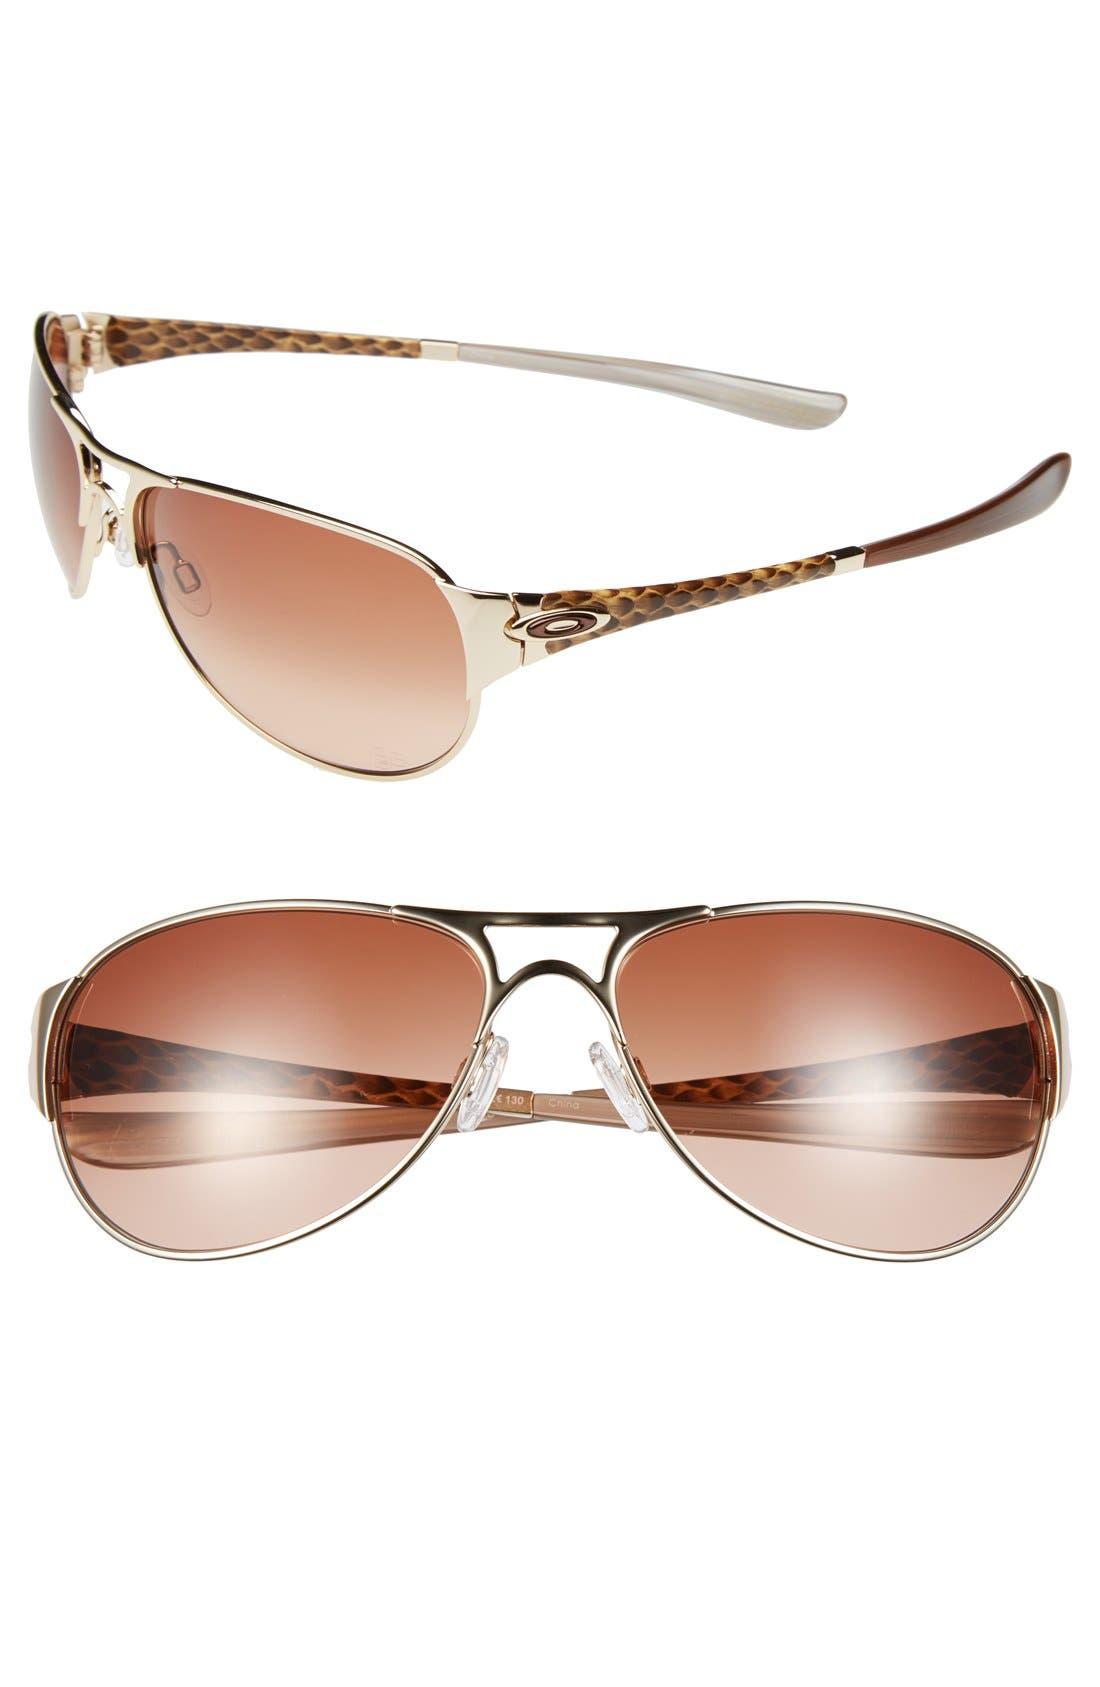 'Gretchen Bleiler Signature Series - Restless' 60mm Sunglasses,                             Main thumbnail 1, color,                             710